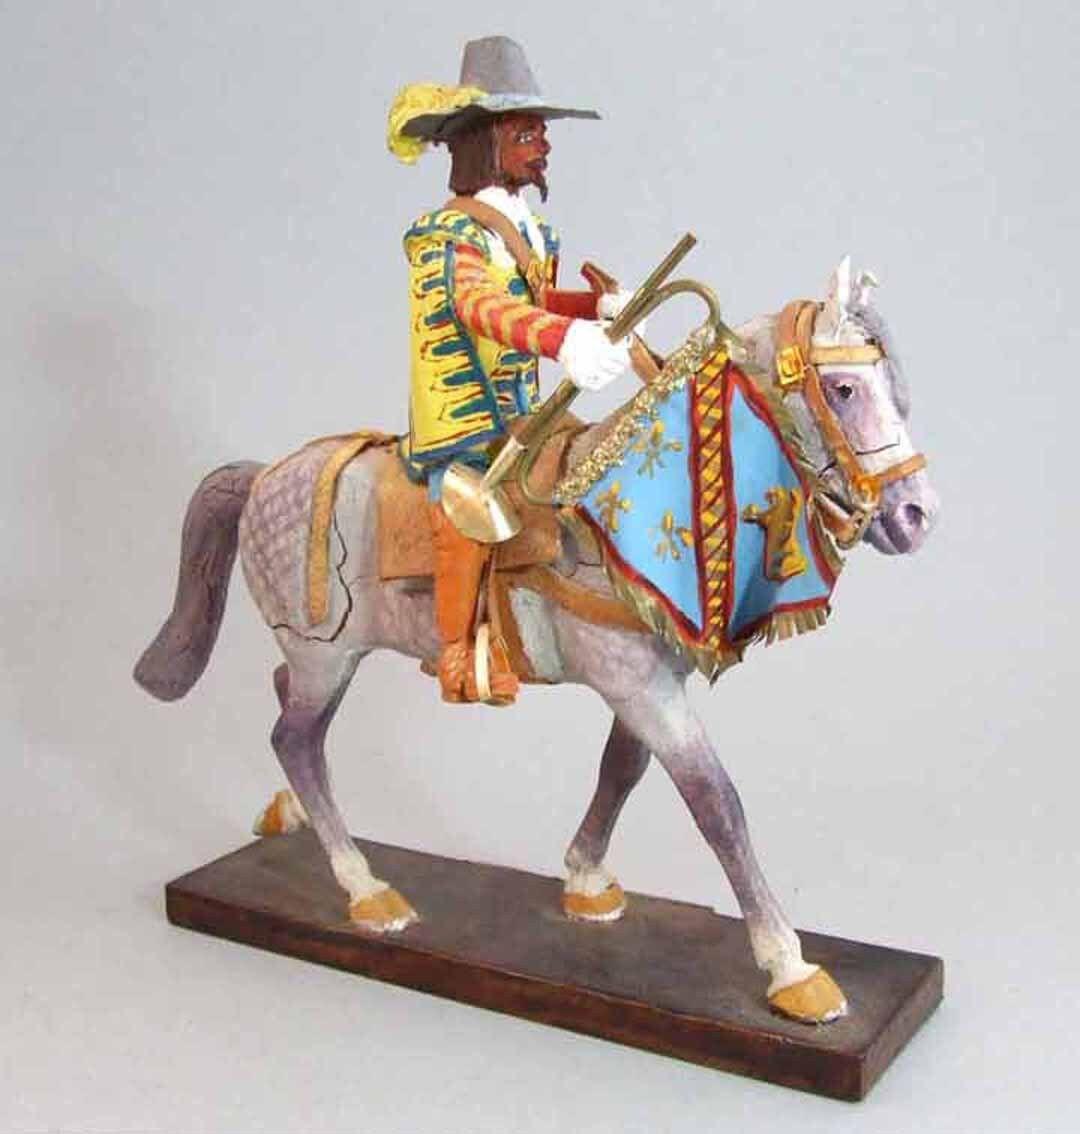 LEMAITRE Figura UNA TROMPETA CABALLO 1627   soldado juguete antiguo